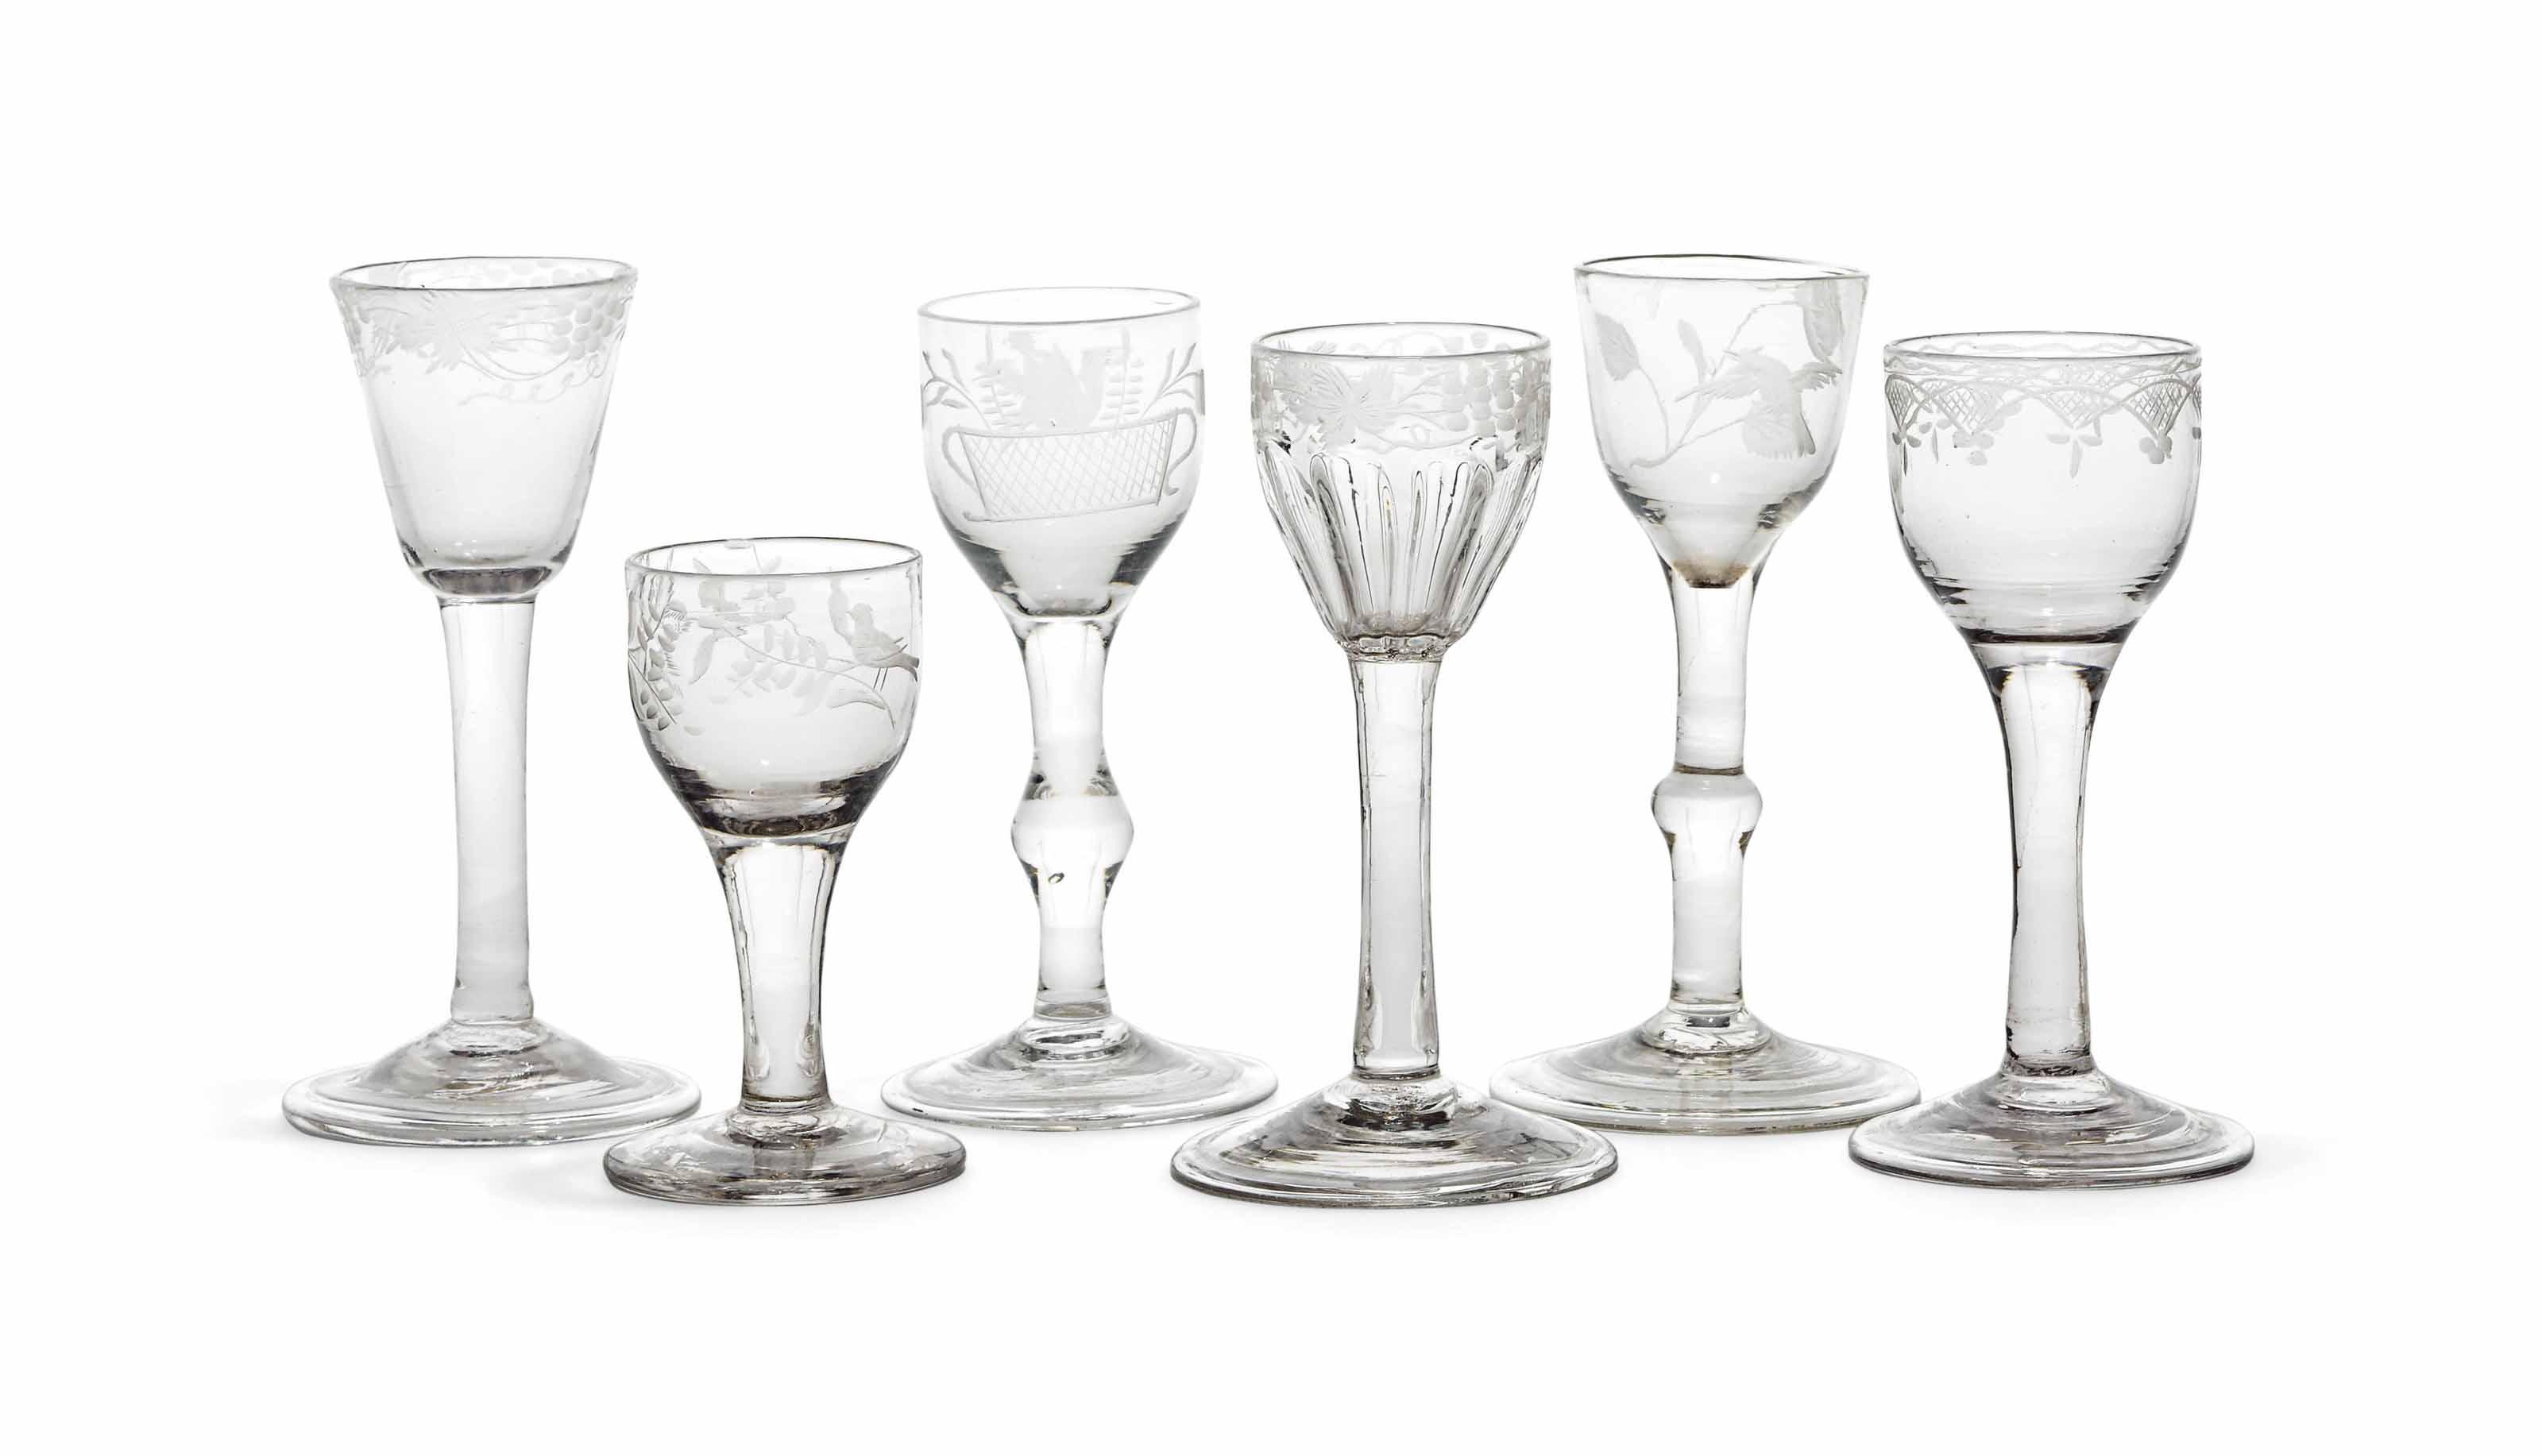 SIX ENGRAVED WINE-GLASSES